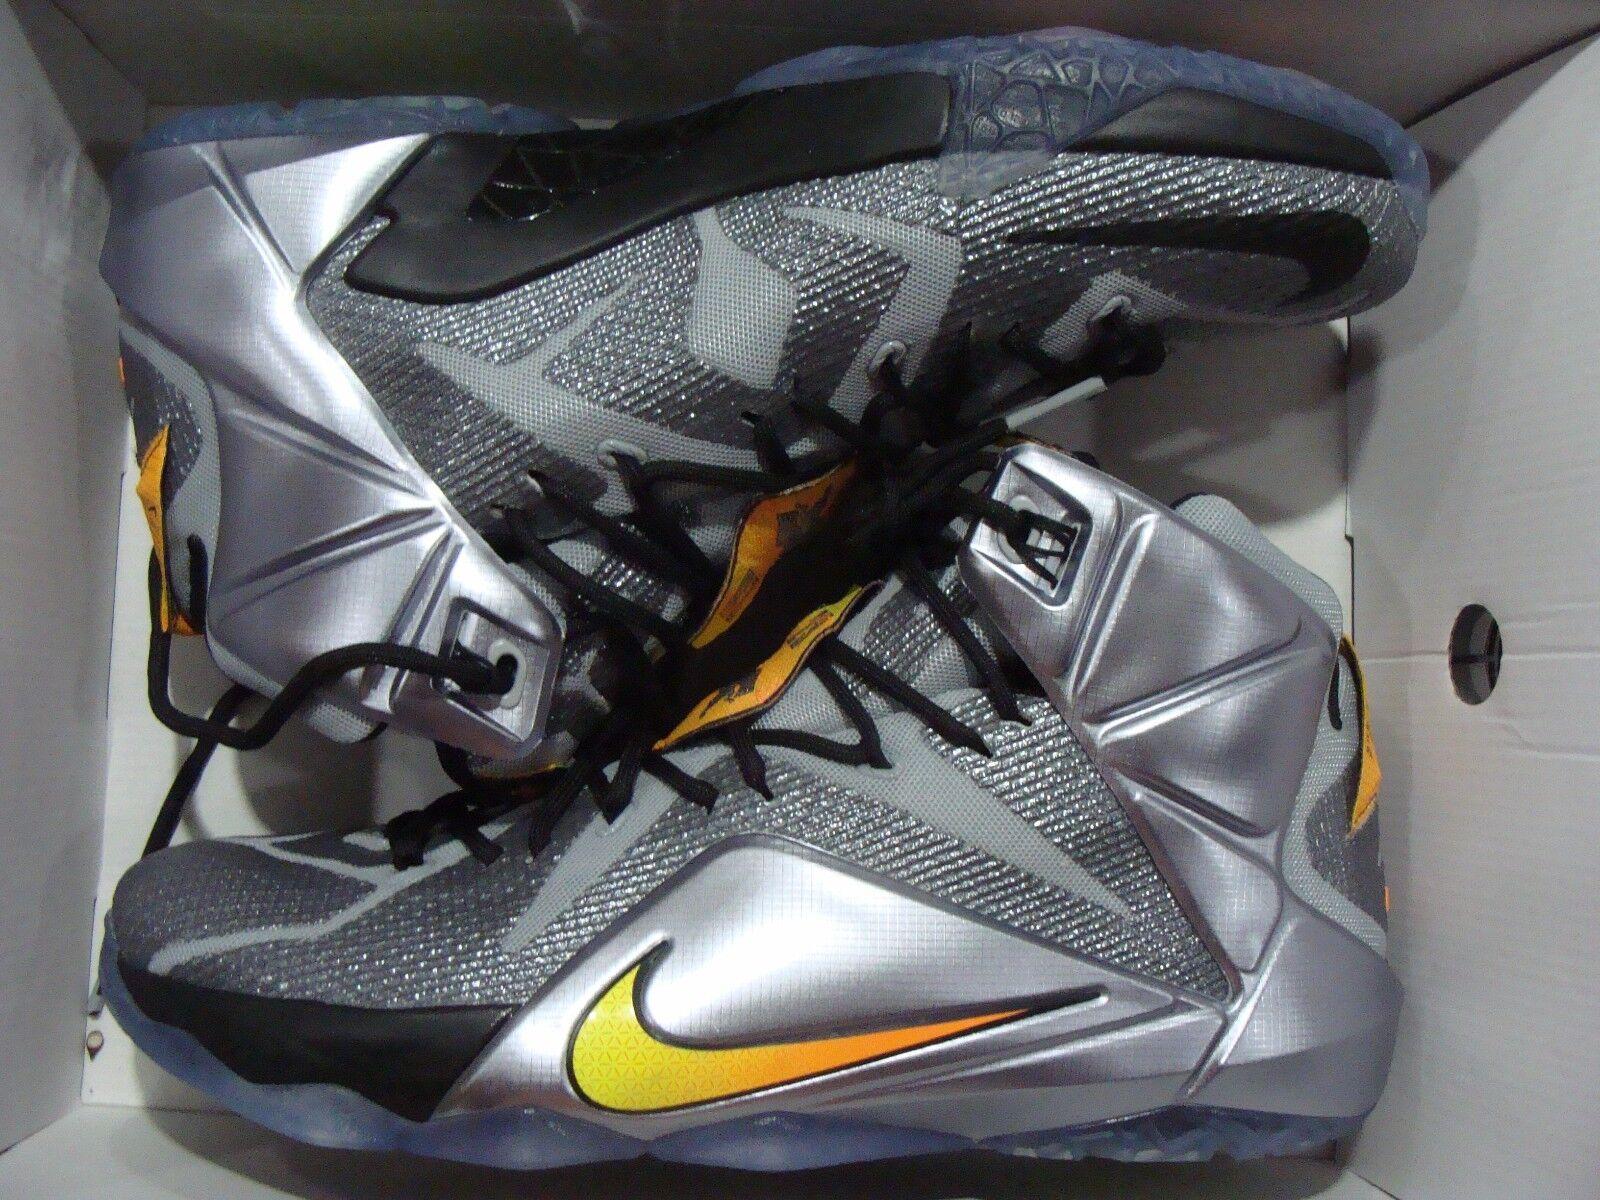 New Men's Nike LeBron XII 684593 Citrus 080 Wolf Grey/Bright Citrus 684593 Black Size 10 2468ed